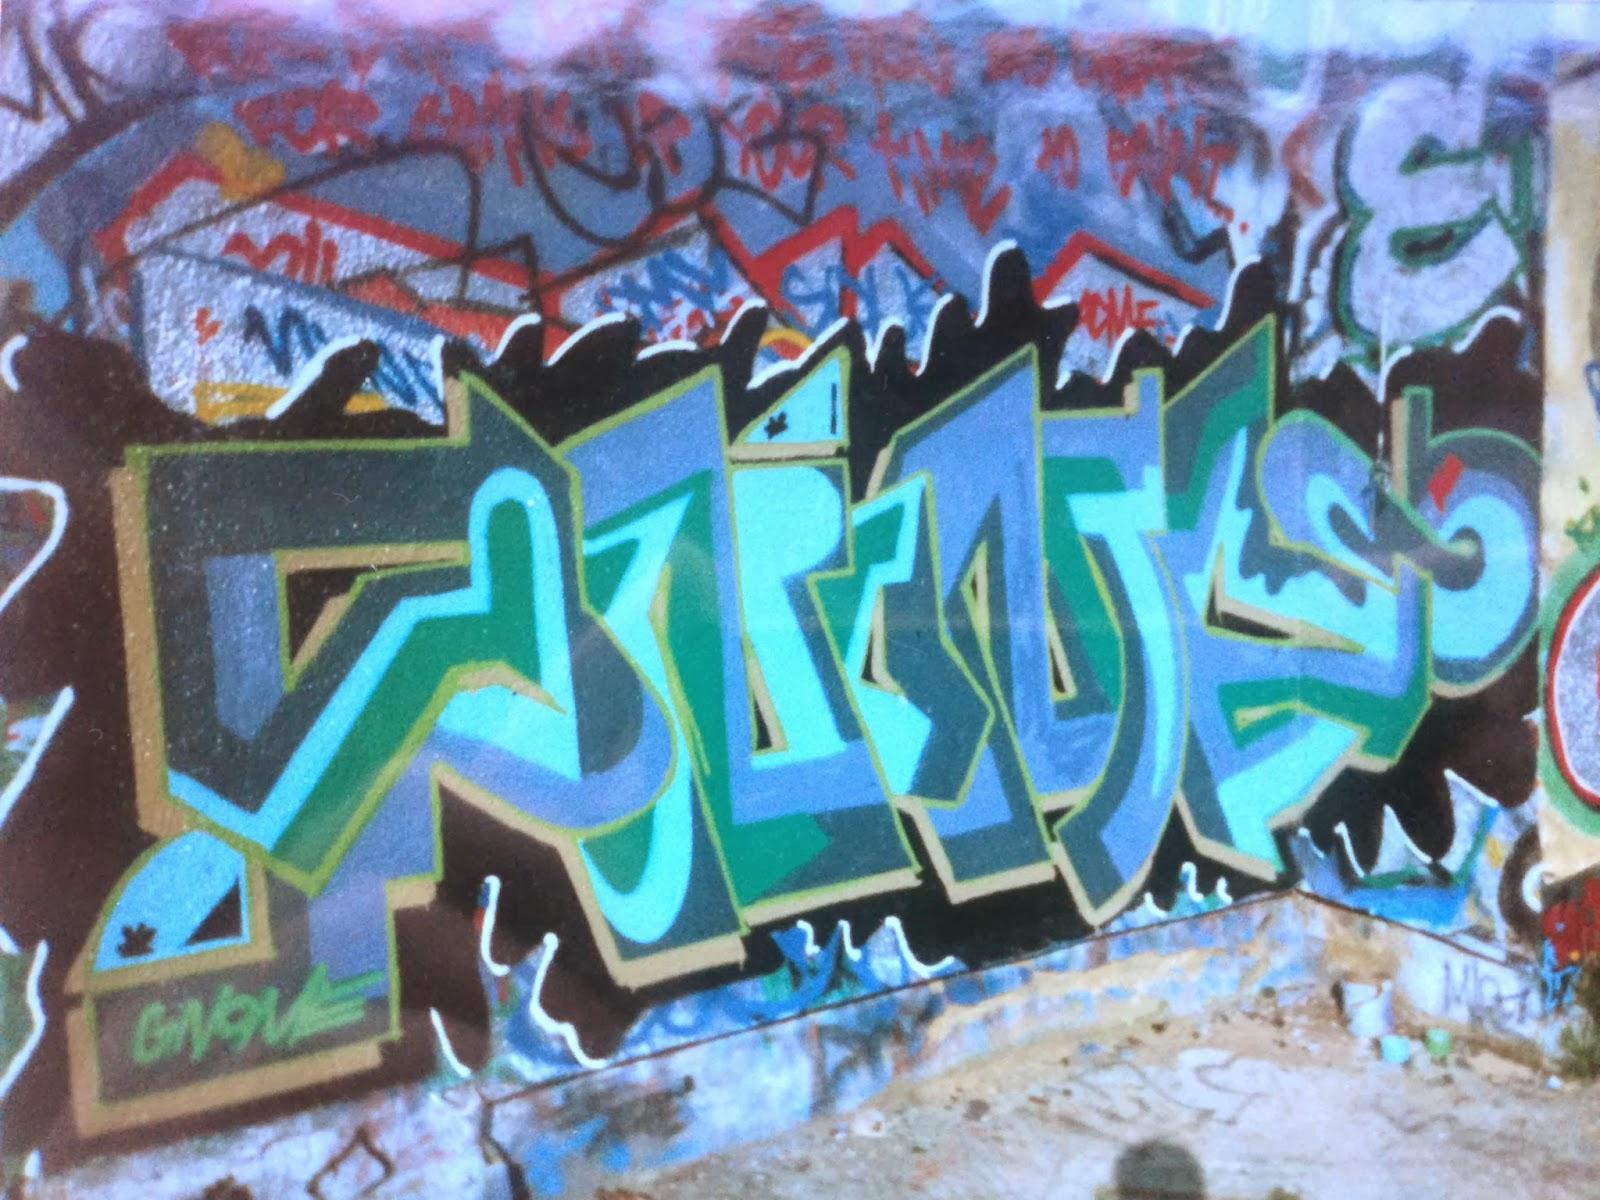 Graffiti Letters Free Vector Art  971 Free Downloads